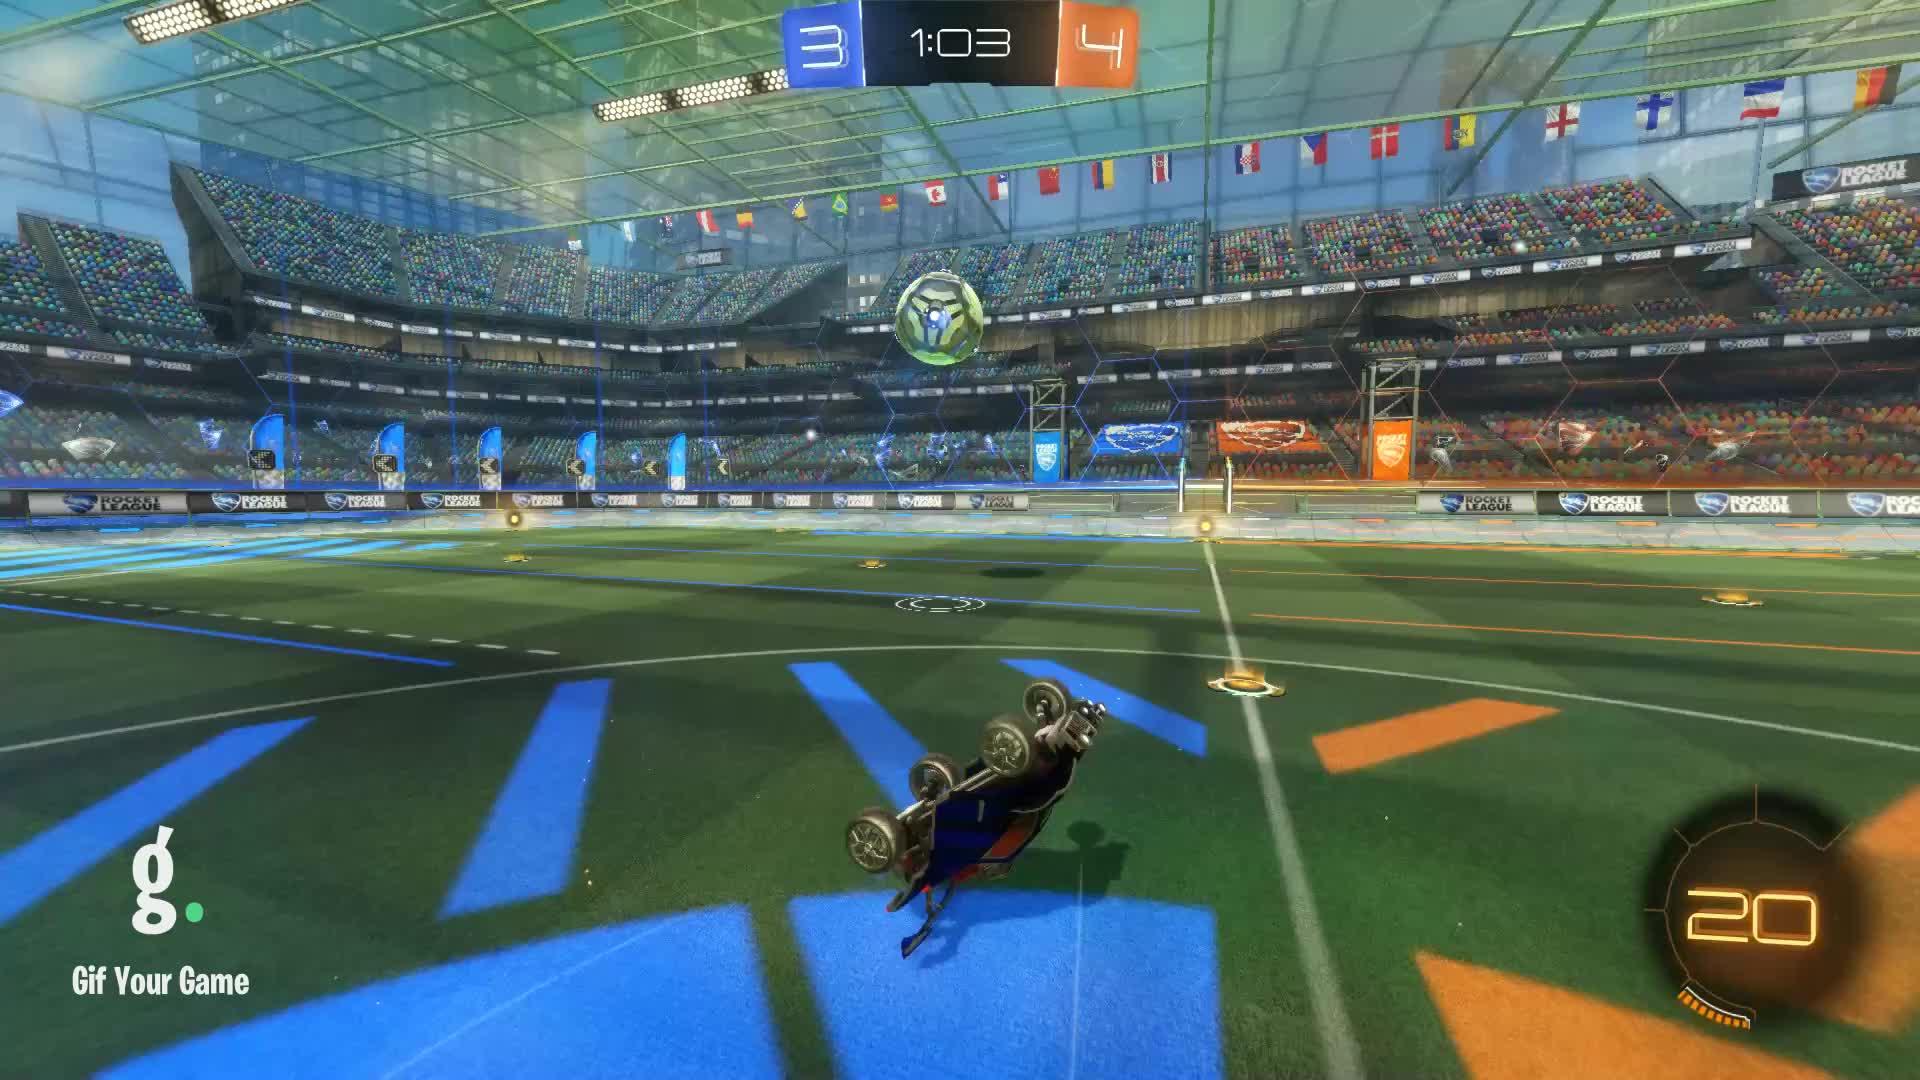 Gif Your Game, GifYourGame, Goal, MK, Rocket League, RocketLeague, Goal 8: MK GIFs